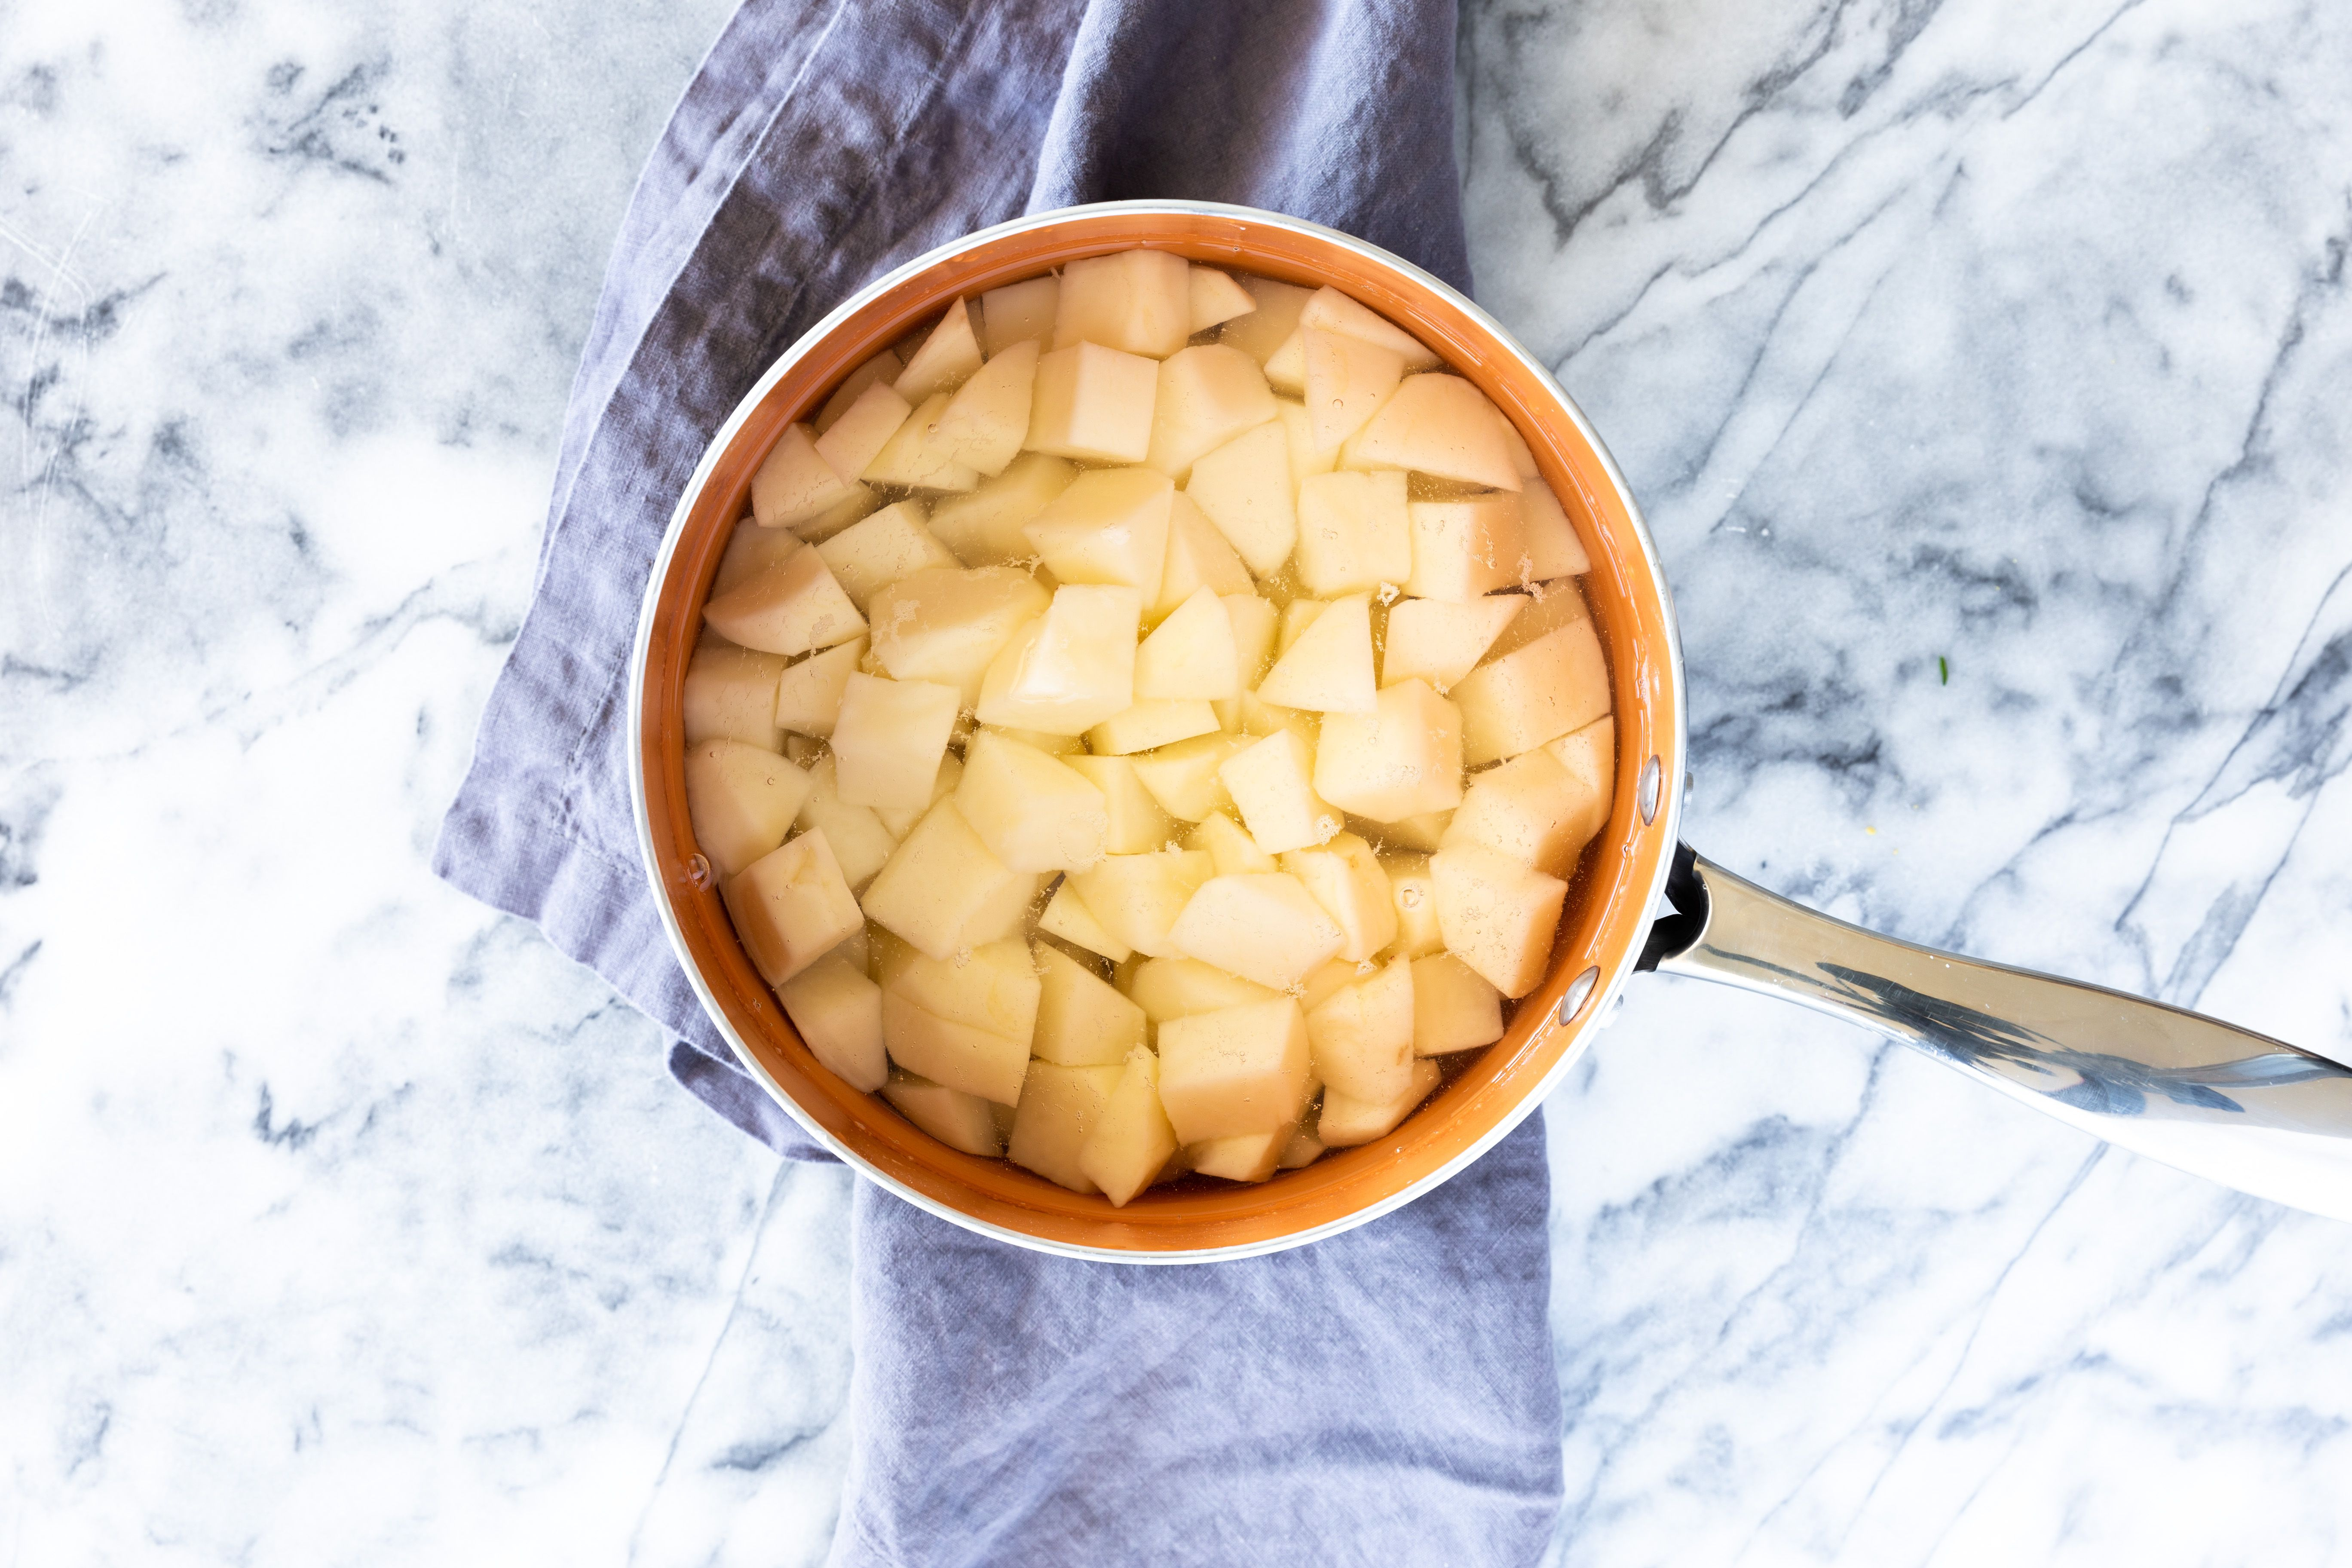 Cubed potato